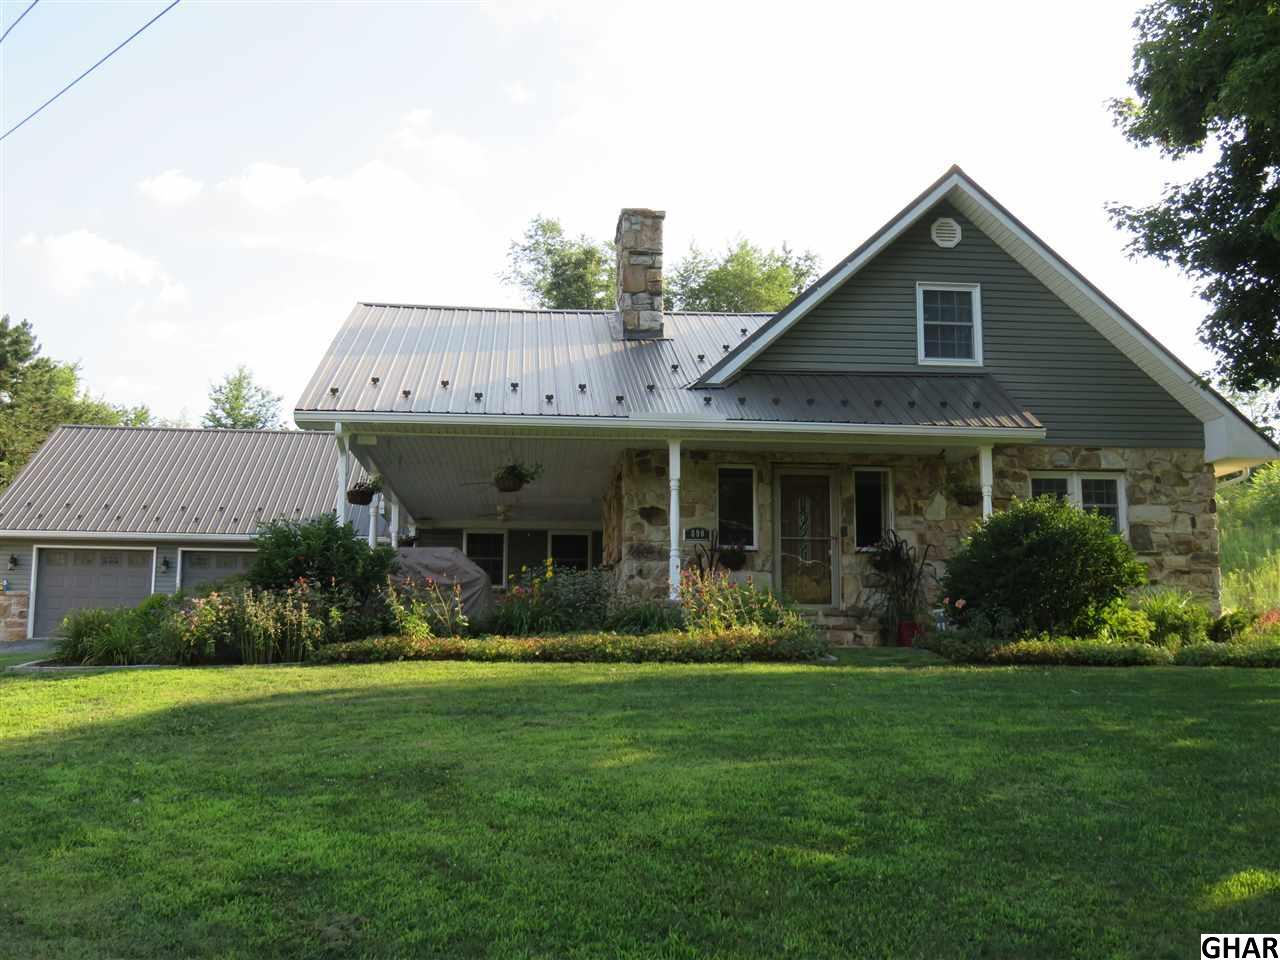 Real Estate for Sale, ListingId: 34577107, Shermans Dale,PA17090